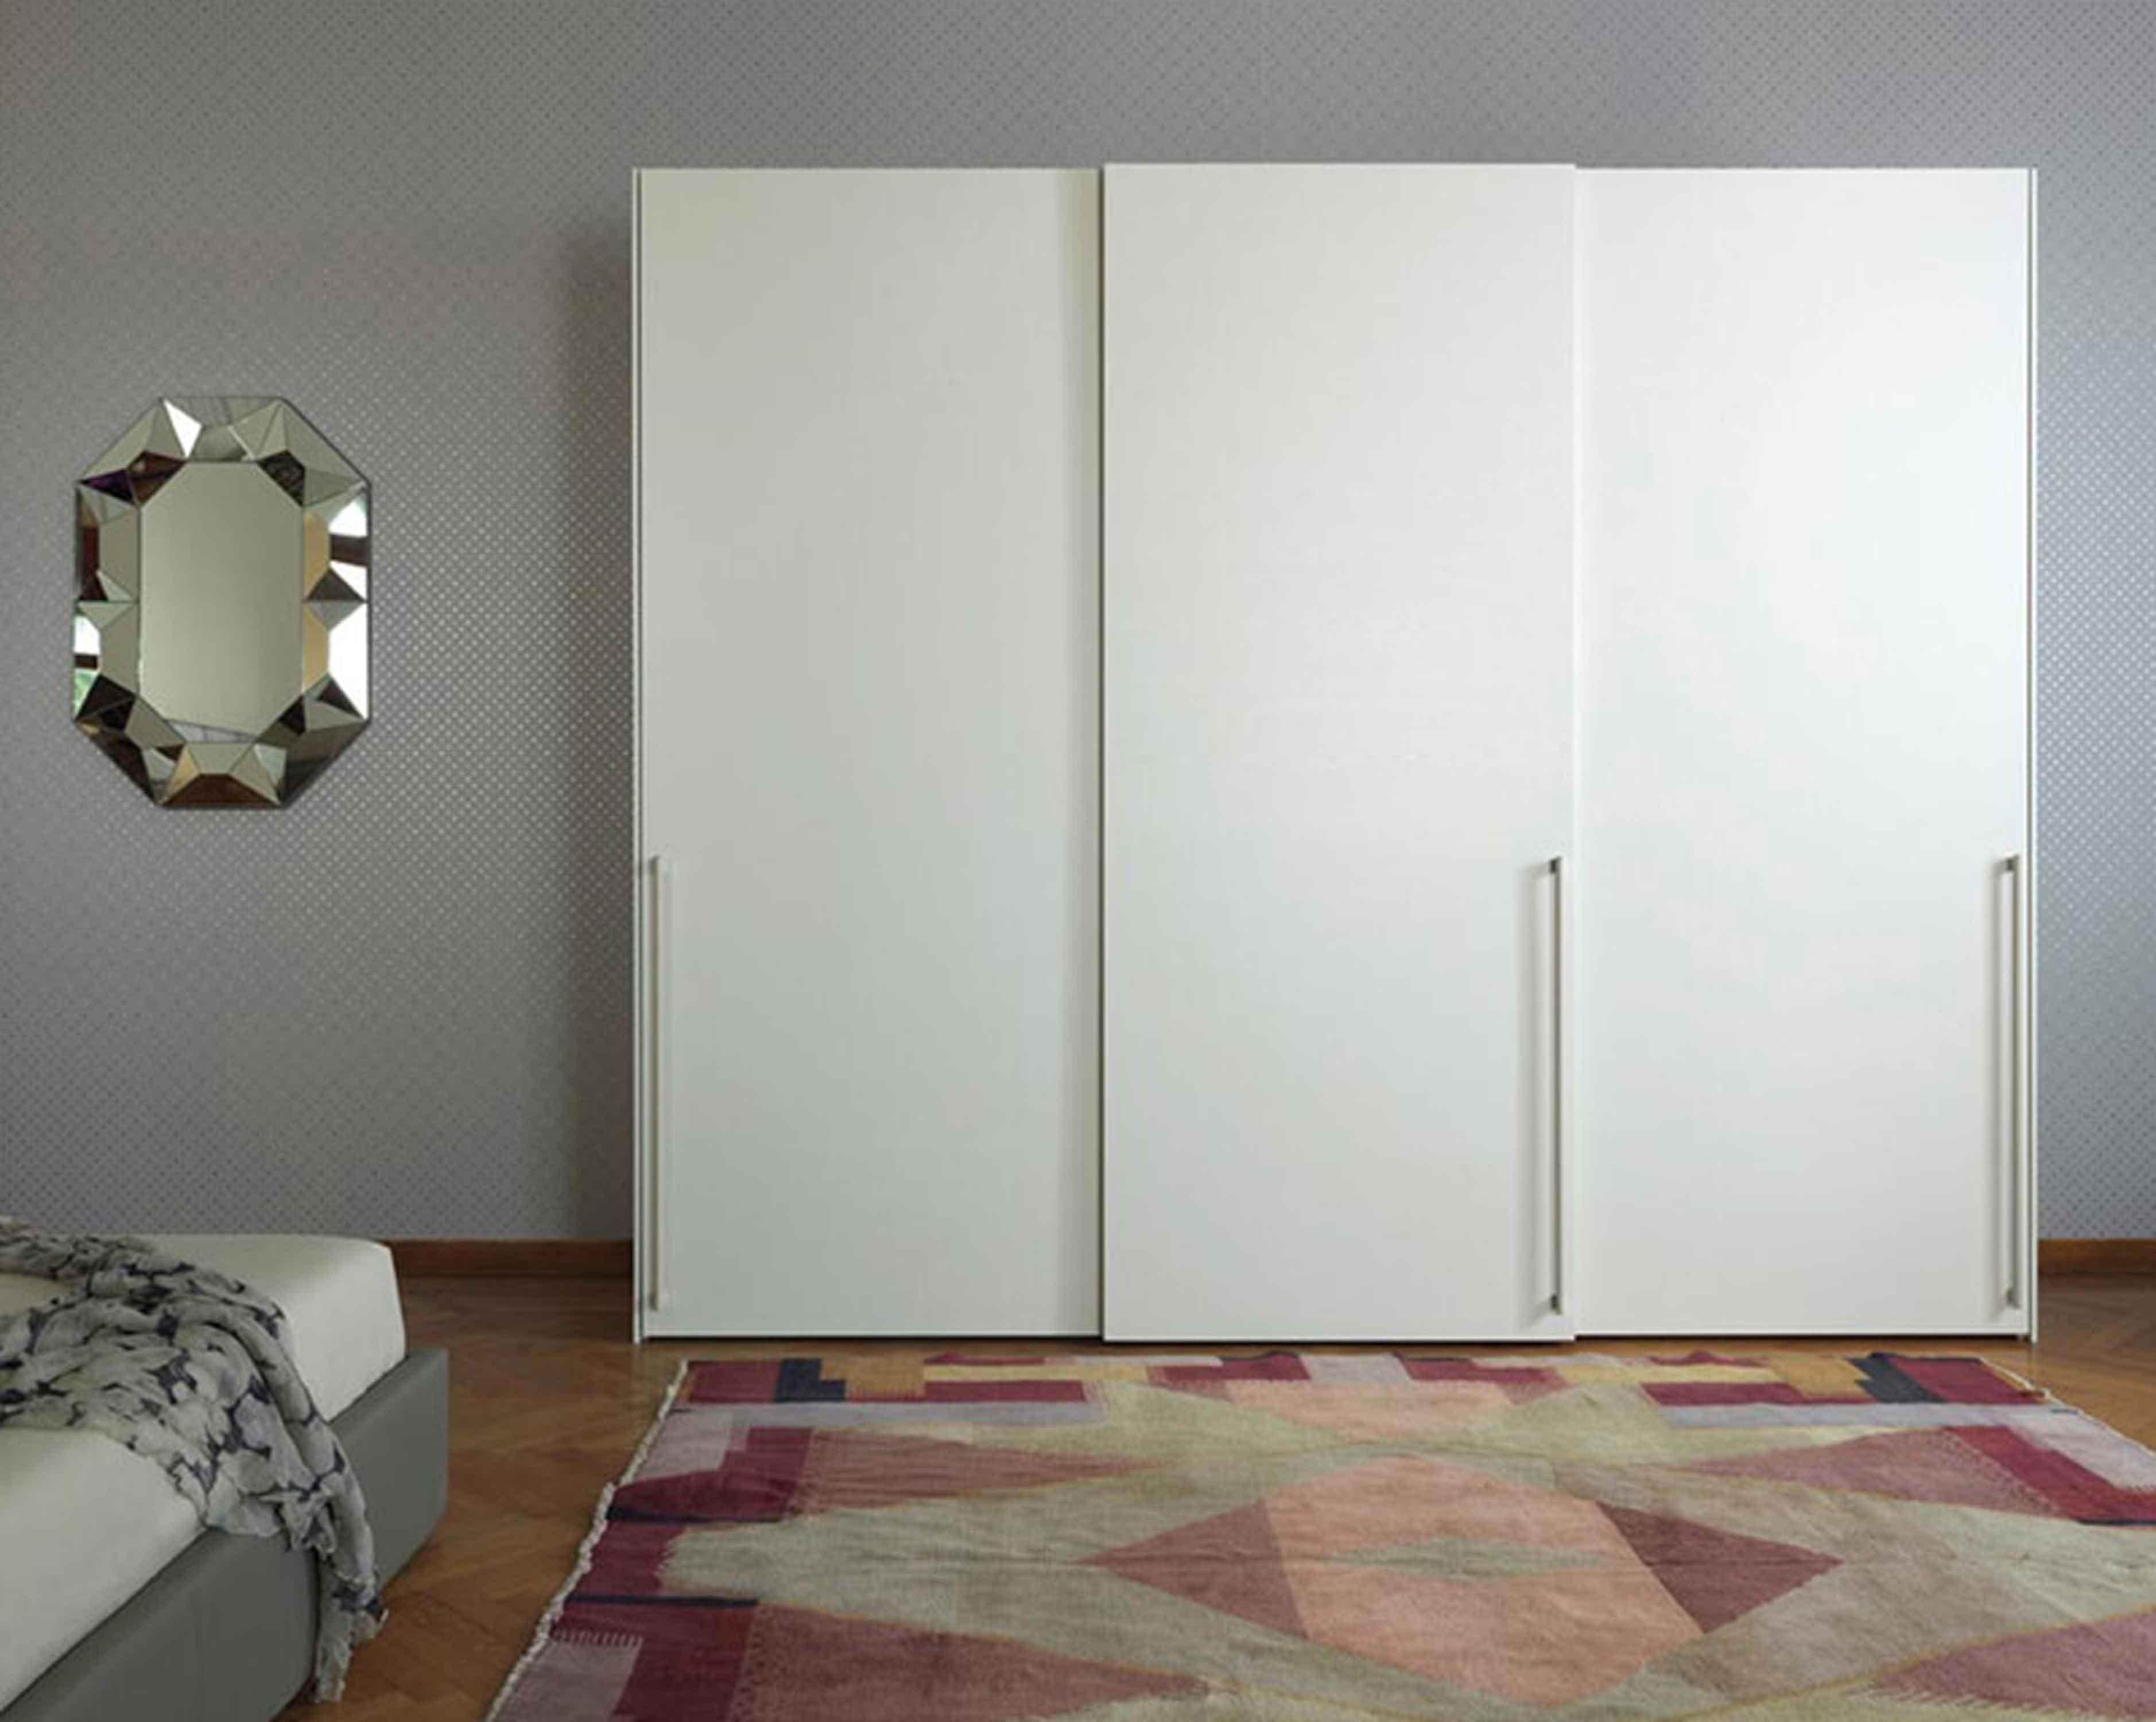 02S_Estel_wardrobe-walk-incloset_ANTEPRIMA